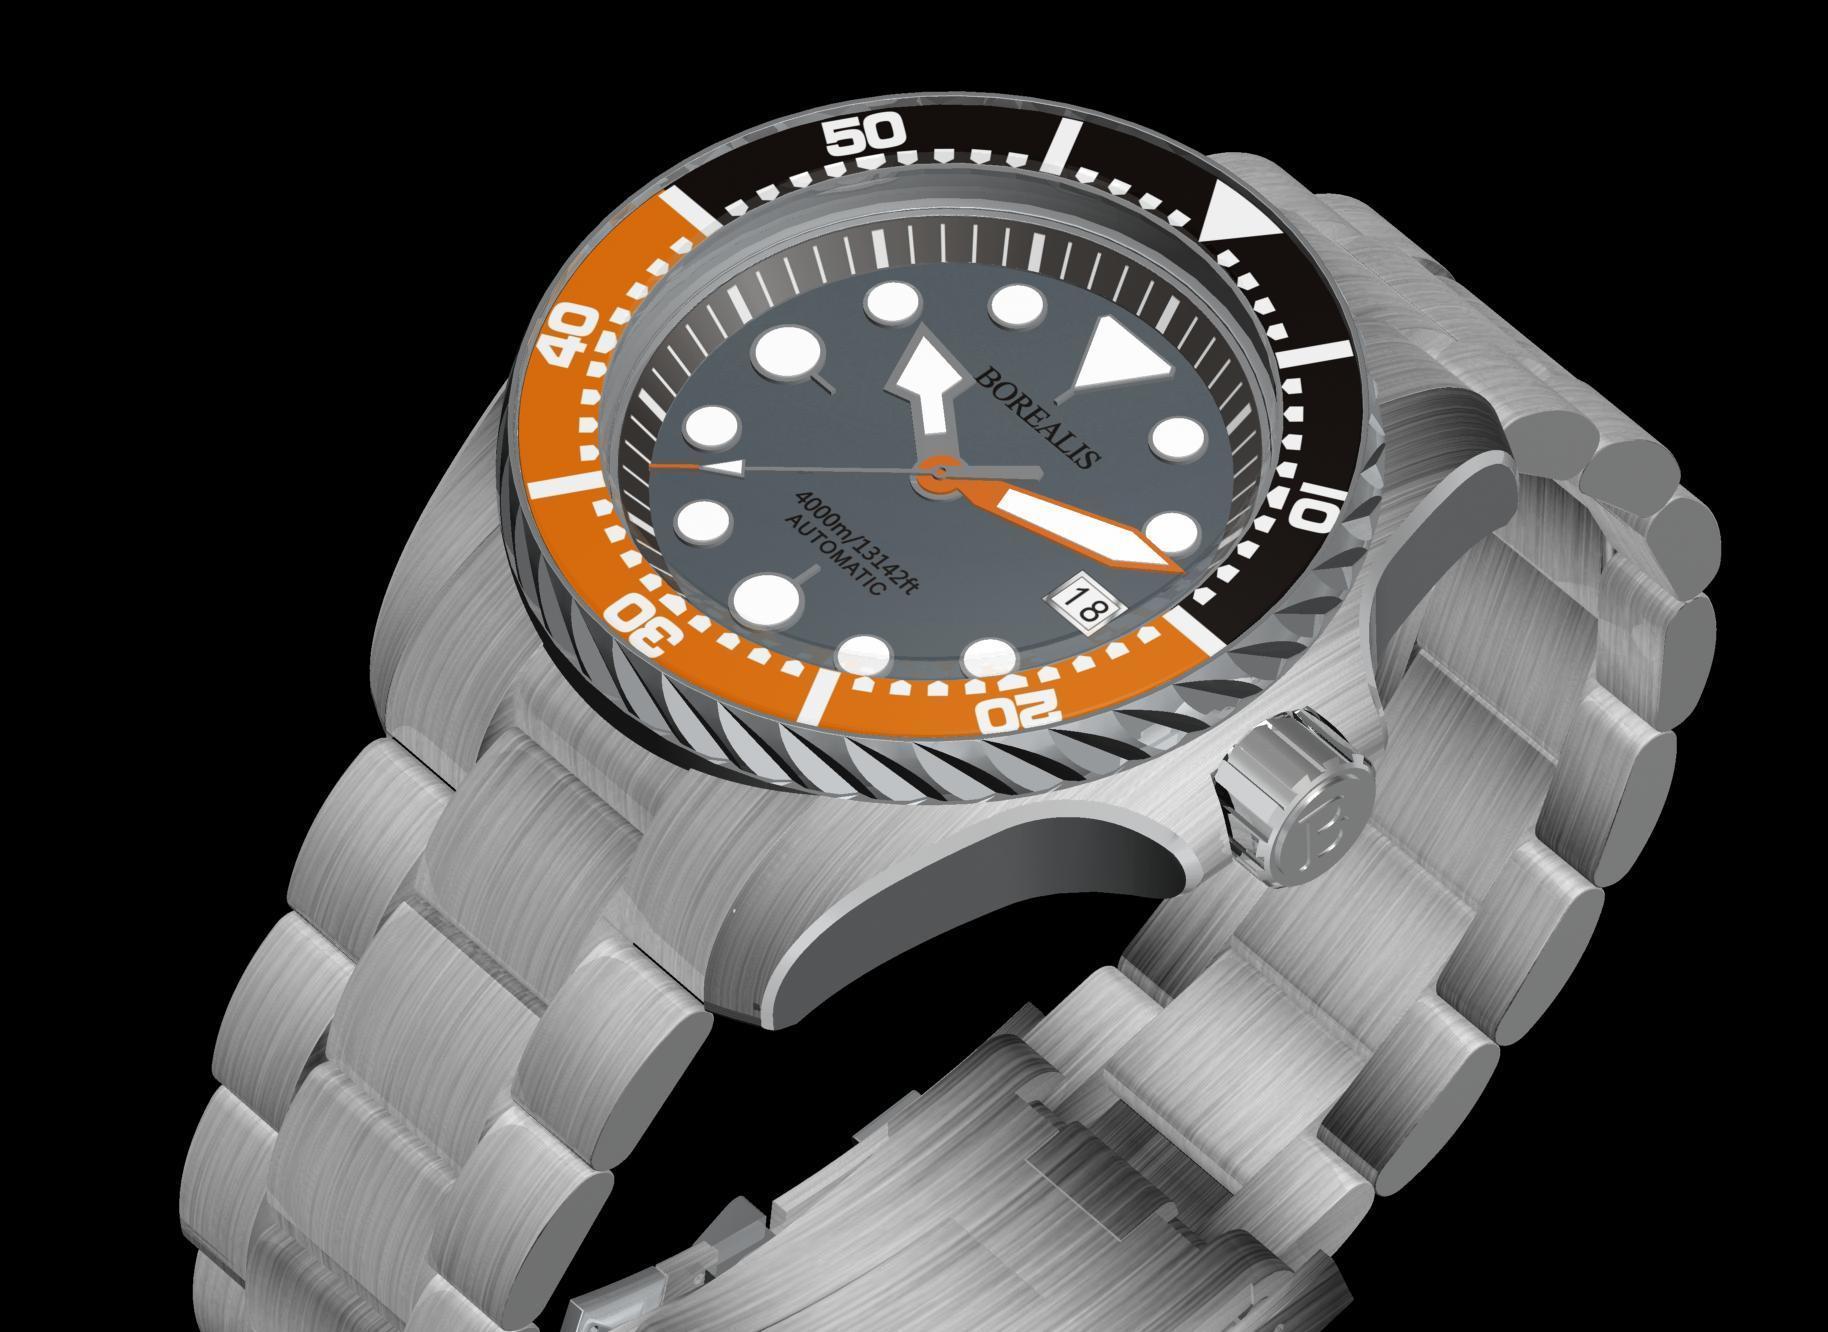 Borealis Seafarer II Stainless Steel Gray Orange BGW9 Sapphire Turbine Style Grip Bezel 4000m Miyota 9015 Automatic Diver Watch